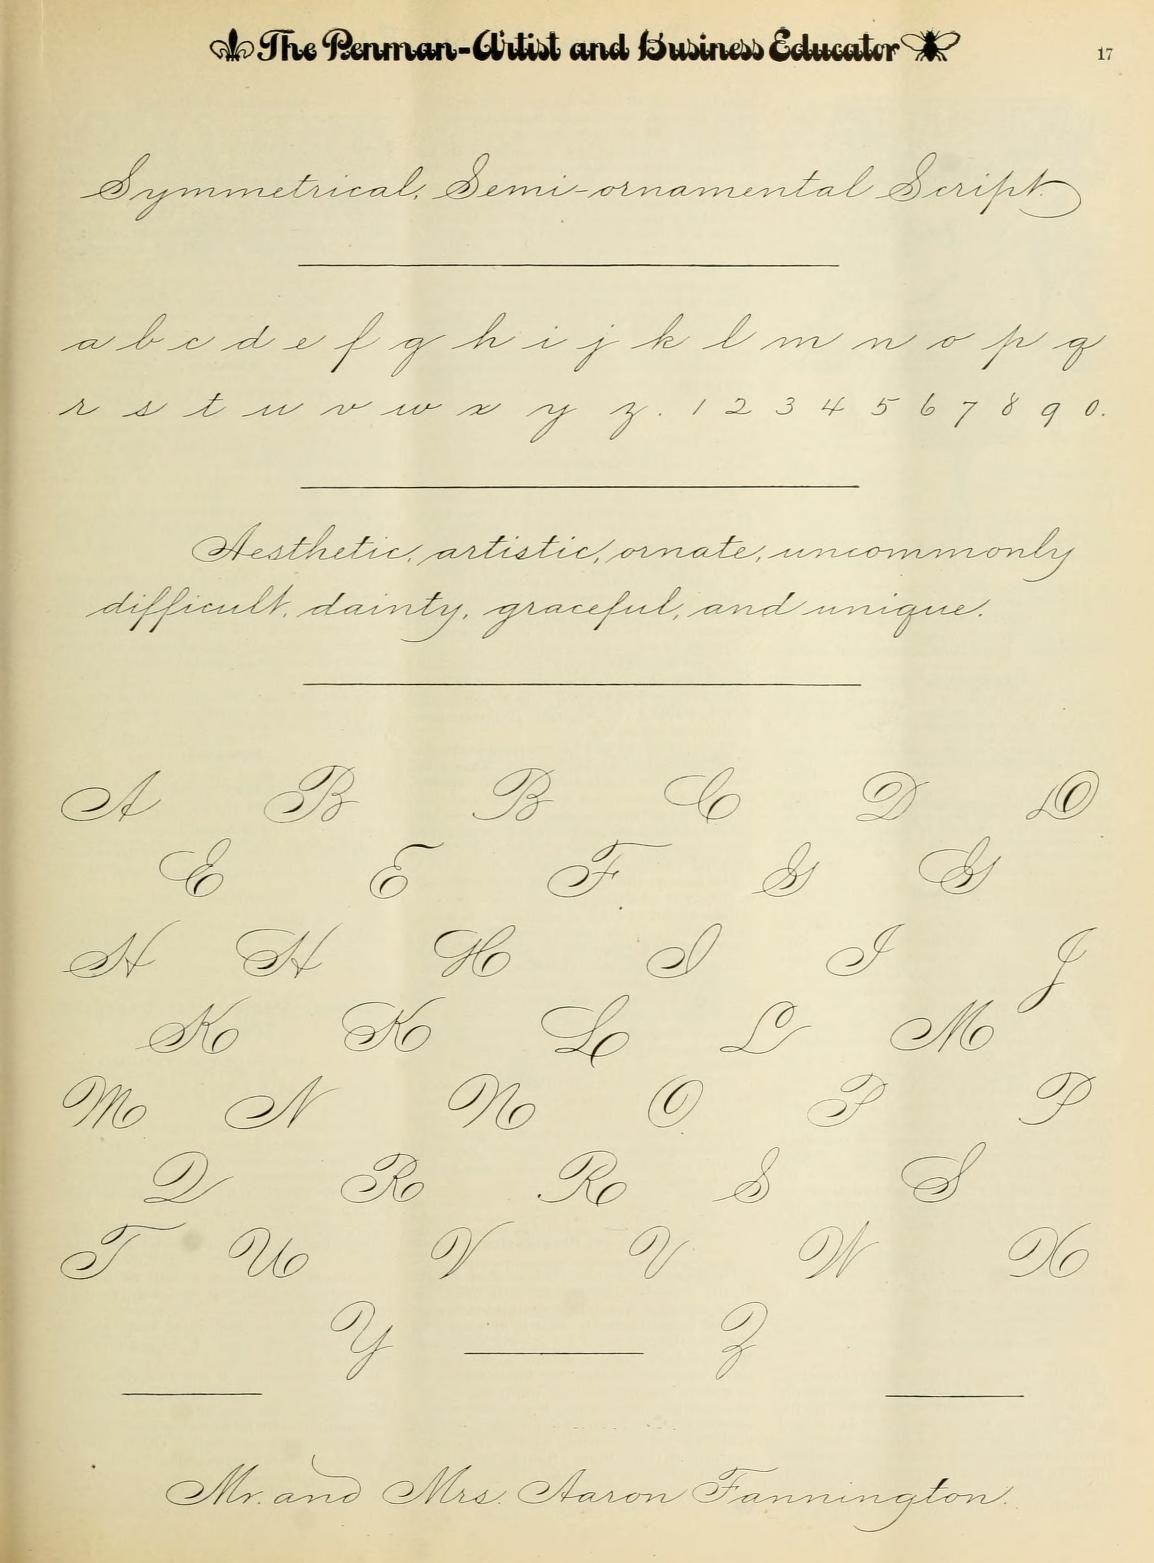 Symmetrical Semi Ornamental Script Exemplar From The